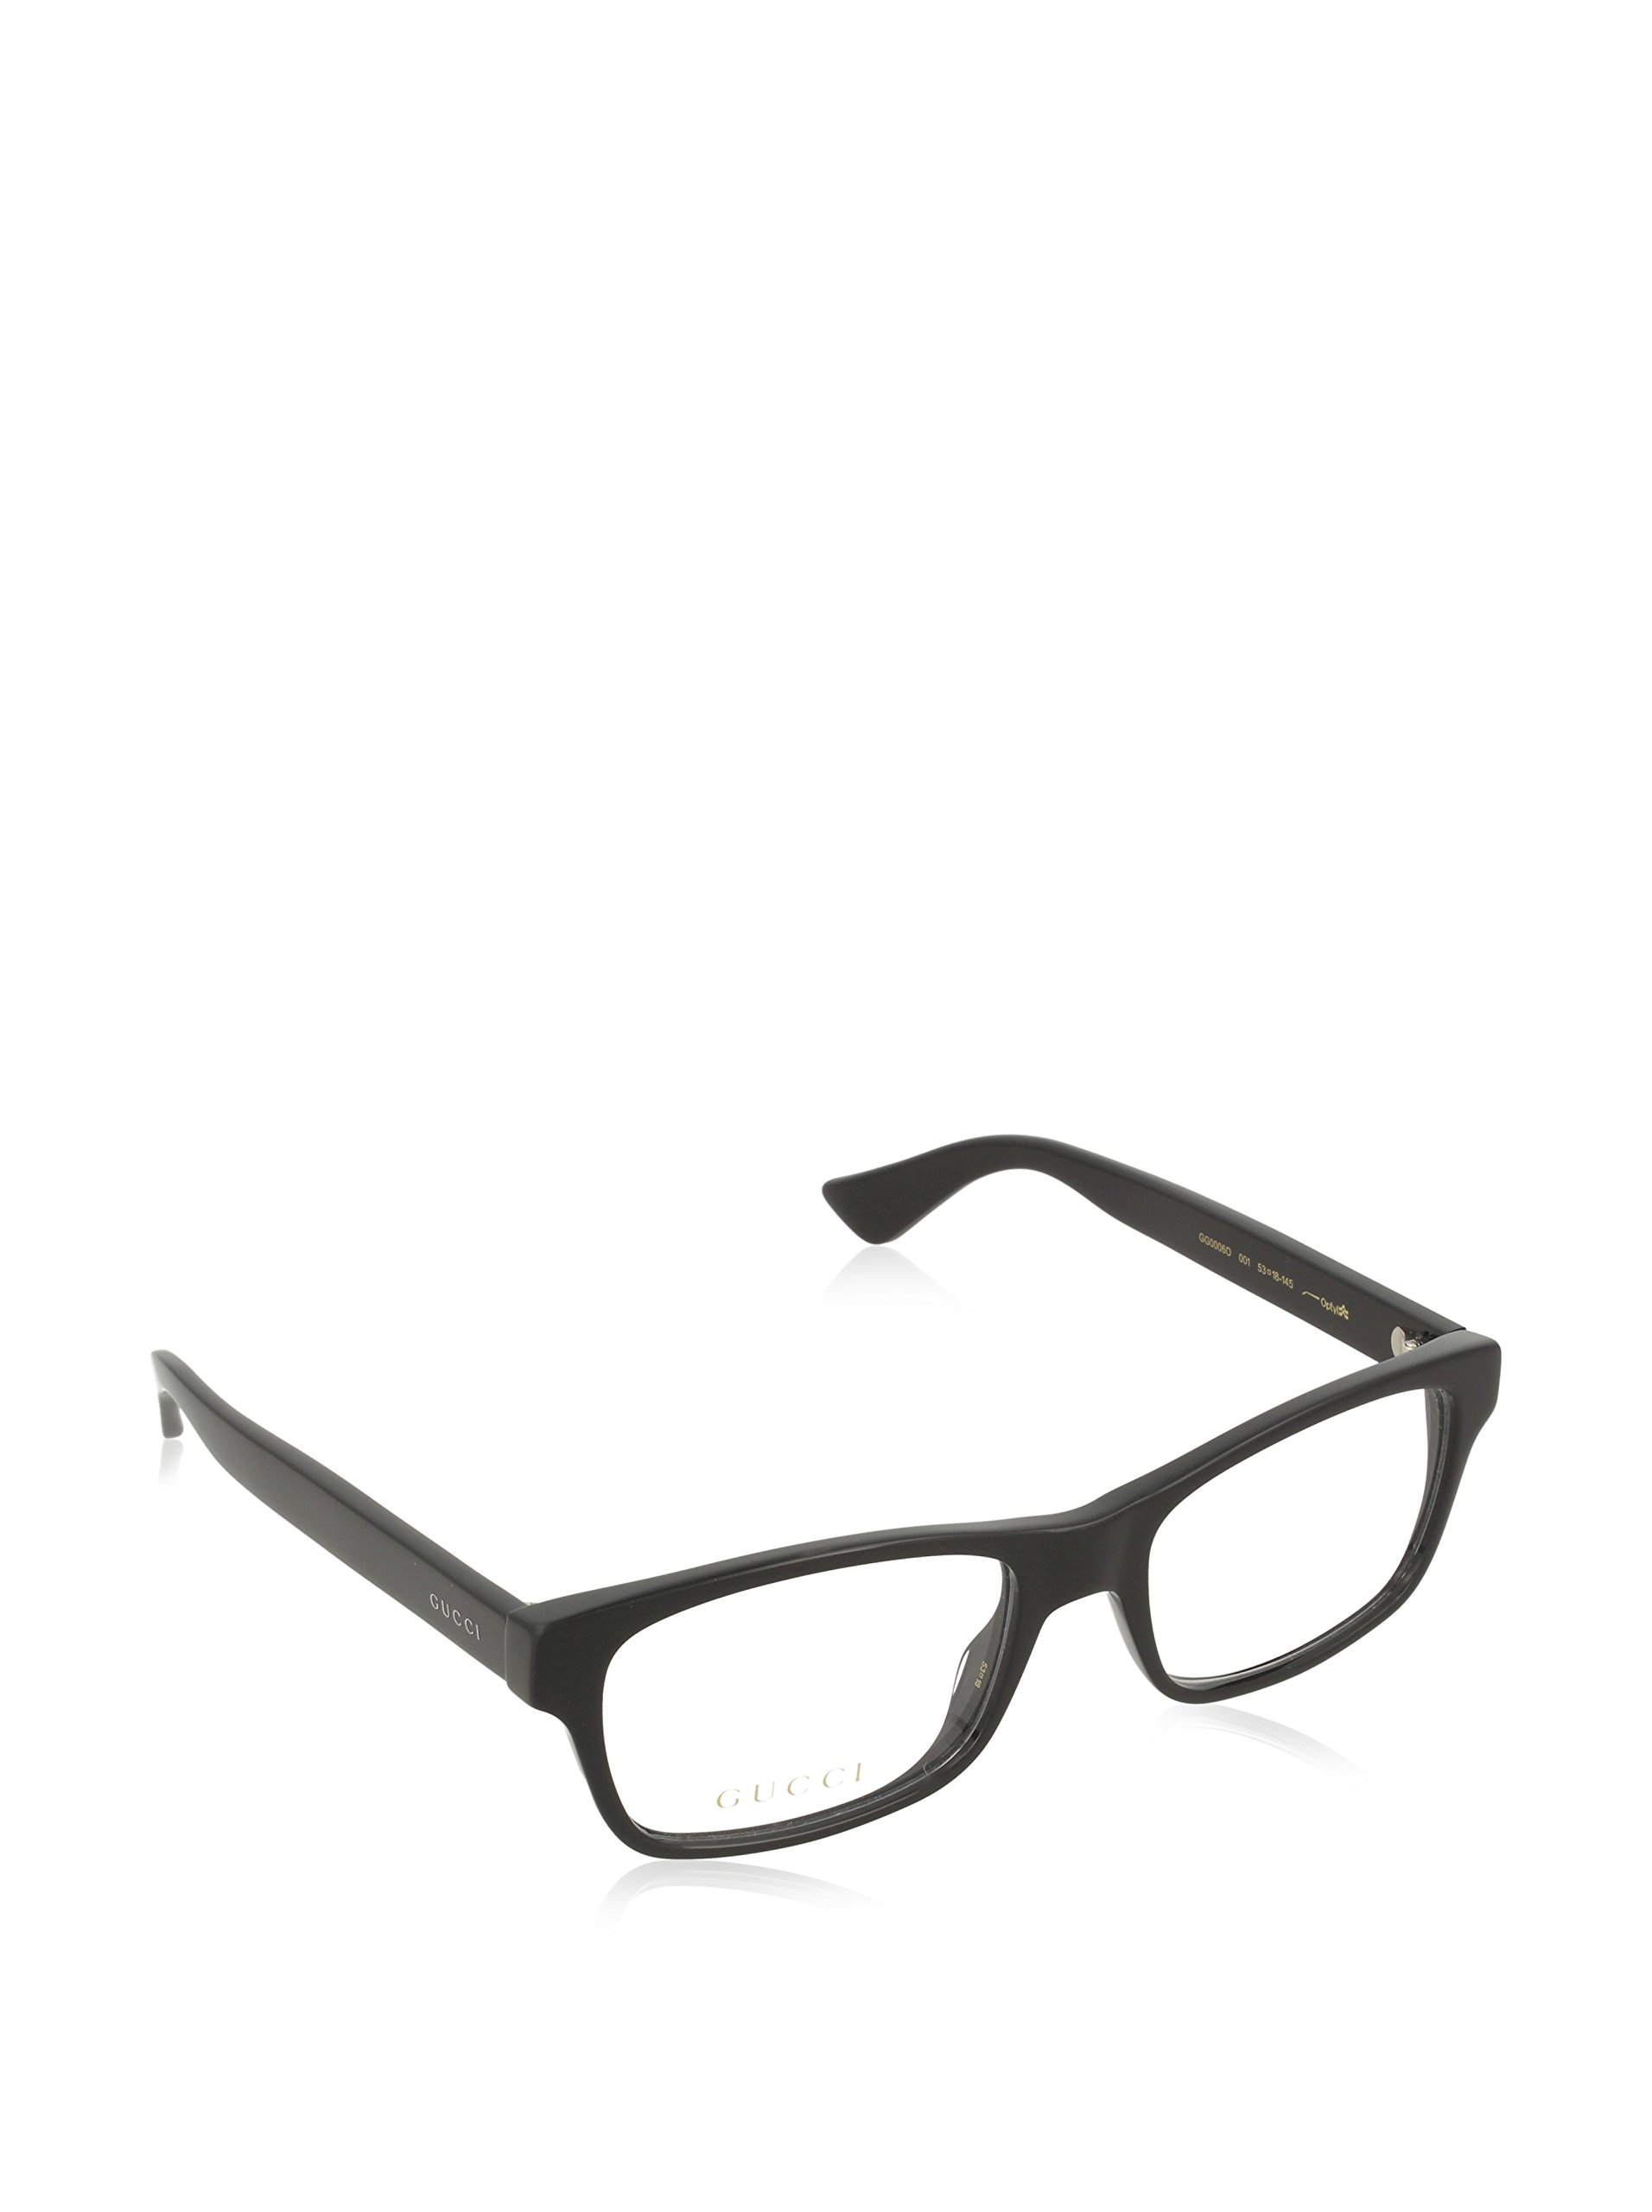 Gucci GG0006O Optical Frame 001 Black Black Transparent 53 mm by Gucci